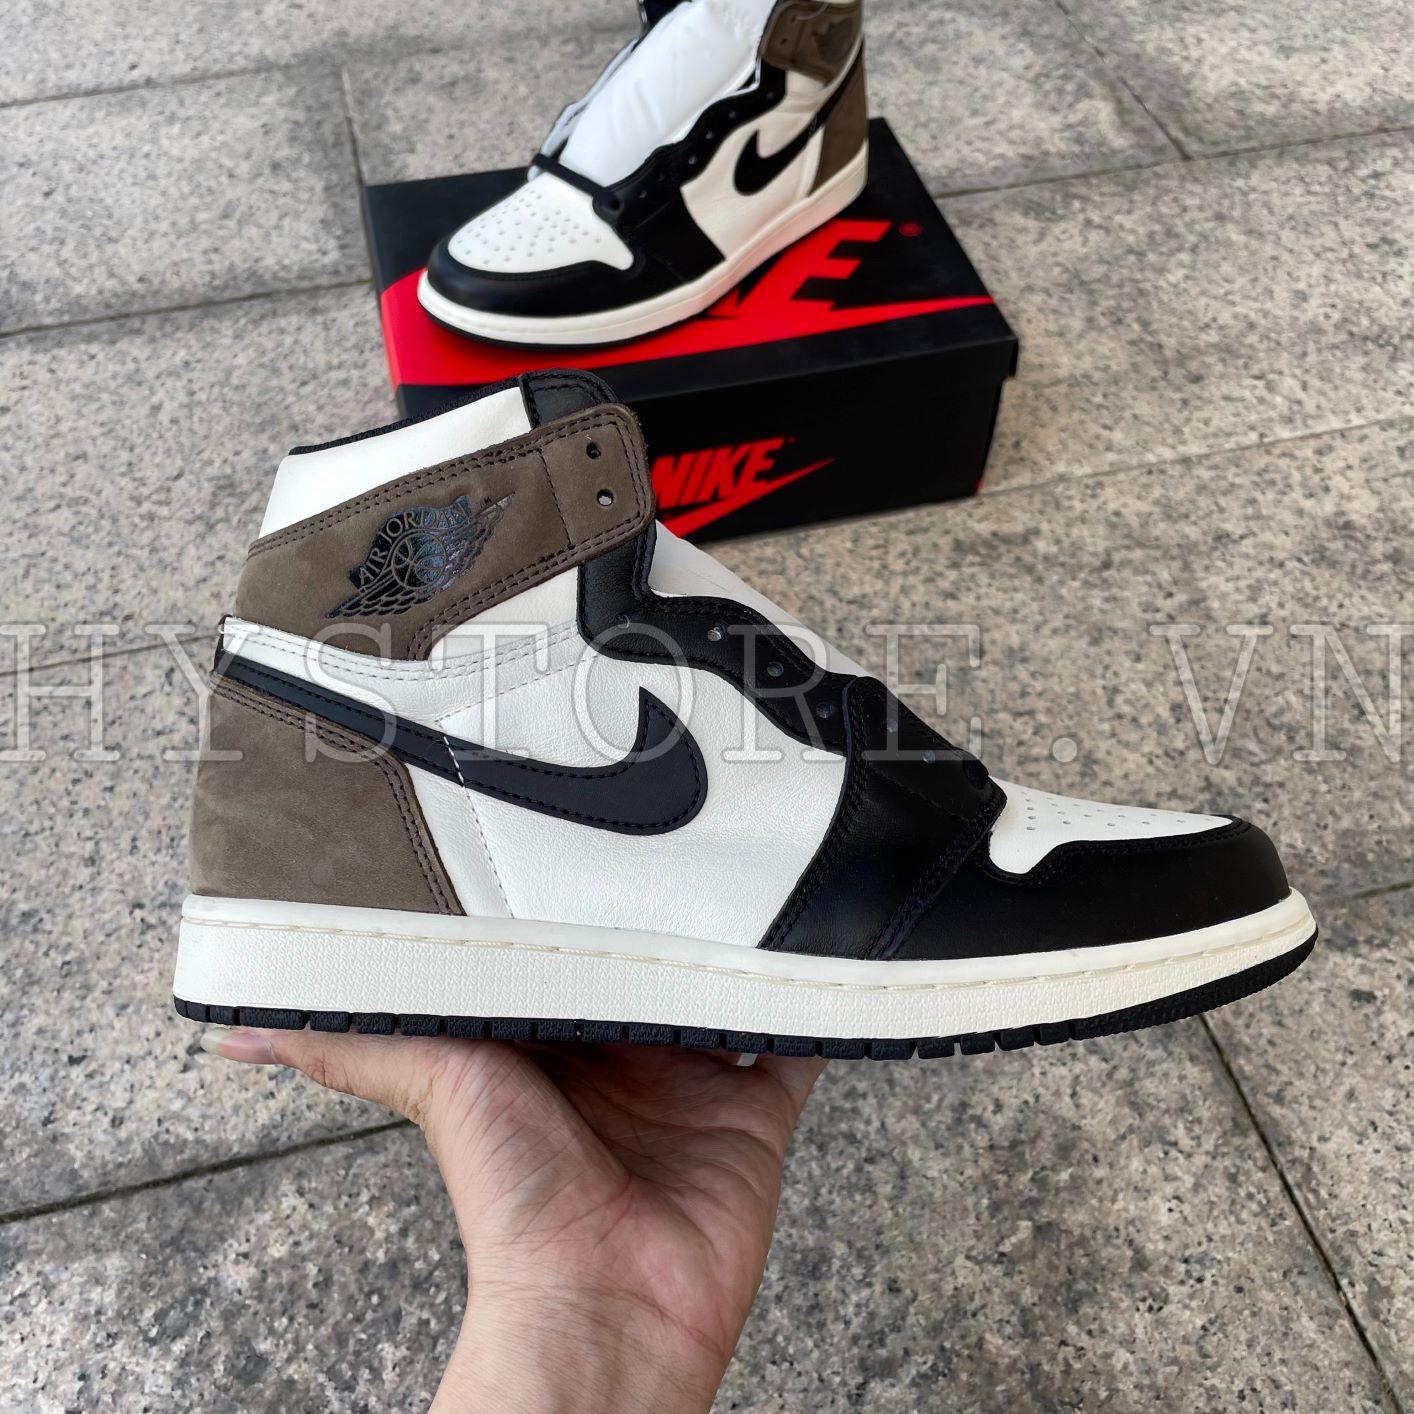 Giày Nike Air Jordan1 High Mocha